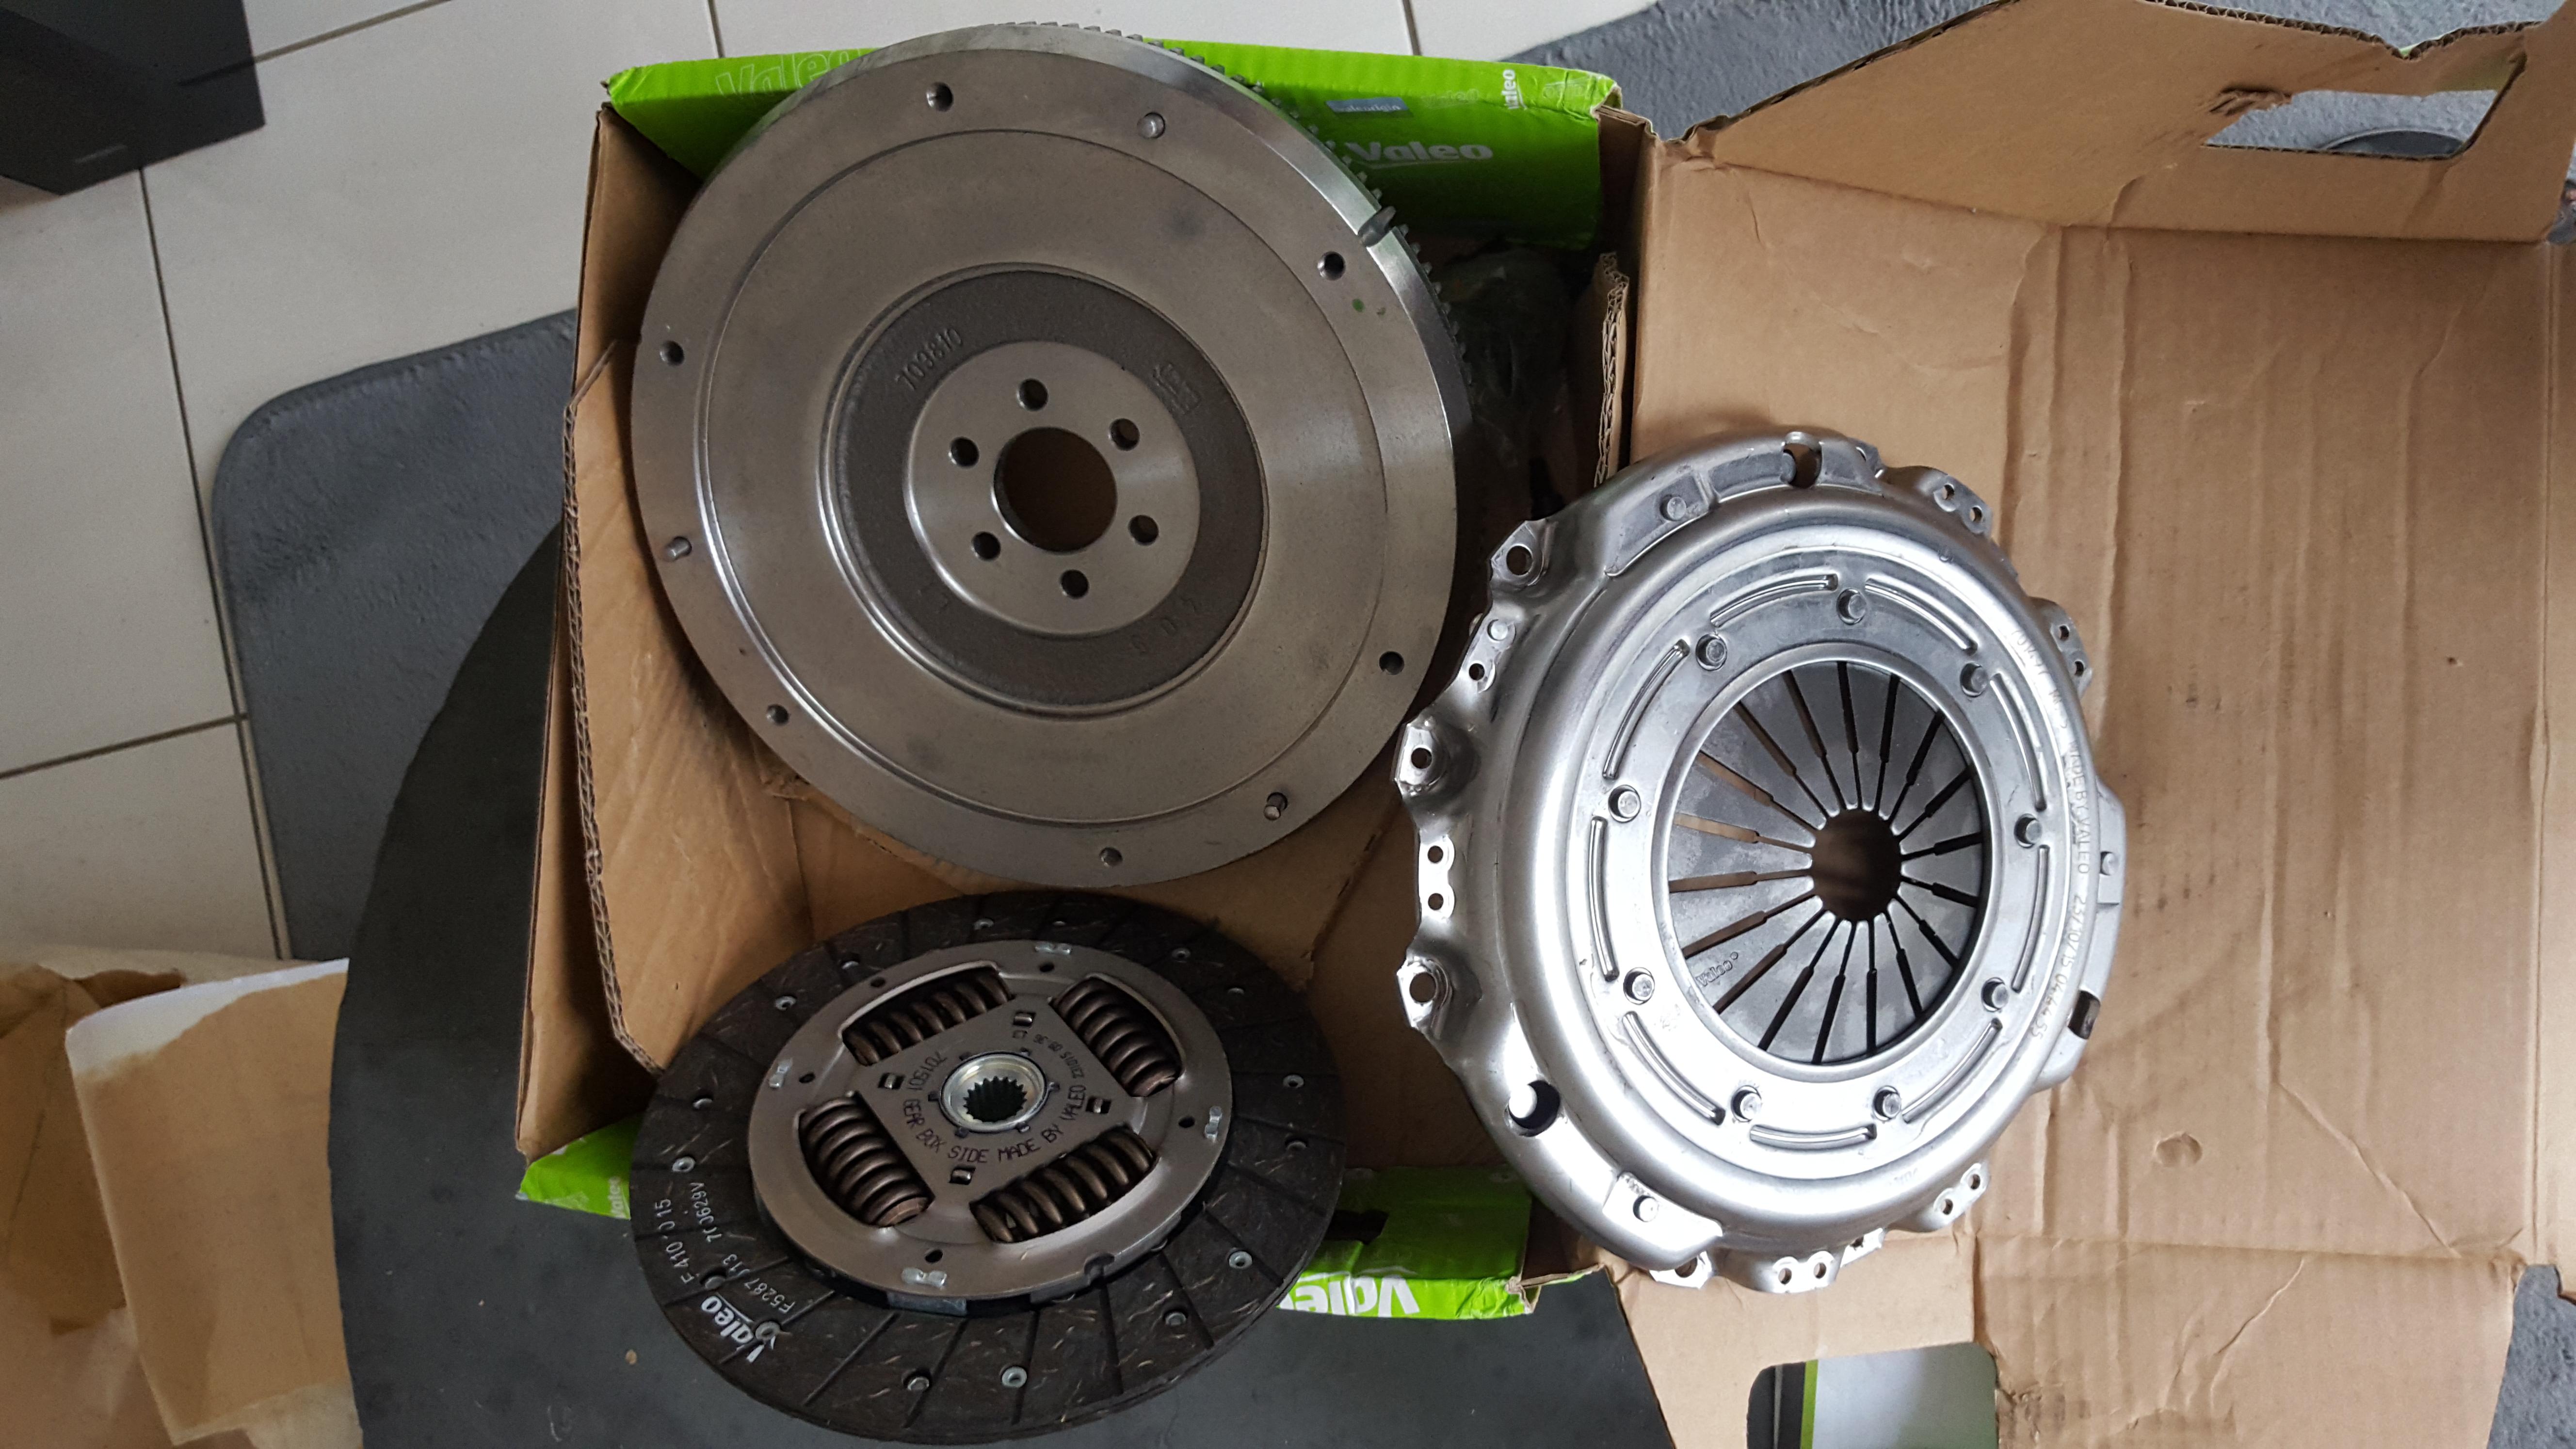 [Massa49] 206 1.6L S16 HDI --> Kit turbo et défapage - Page 2 54661220160204115220